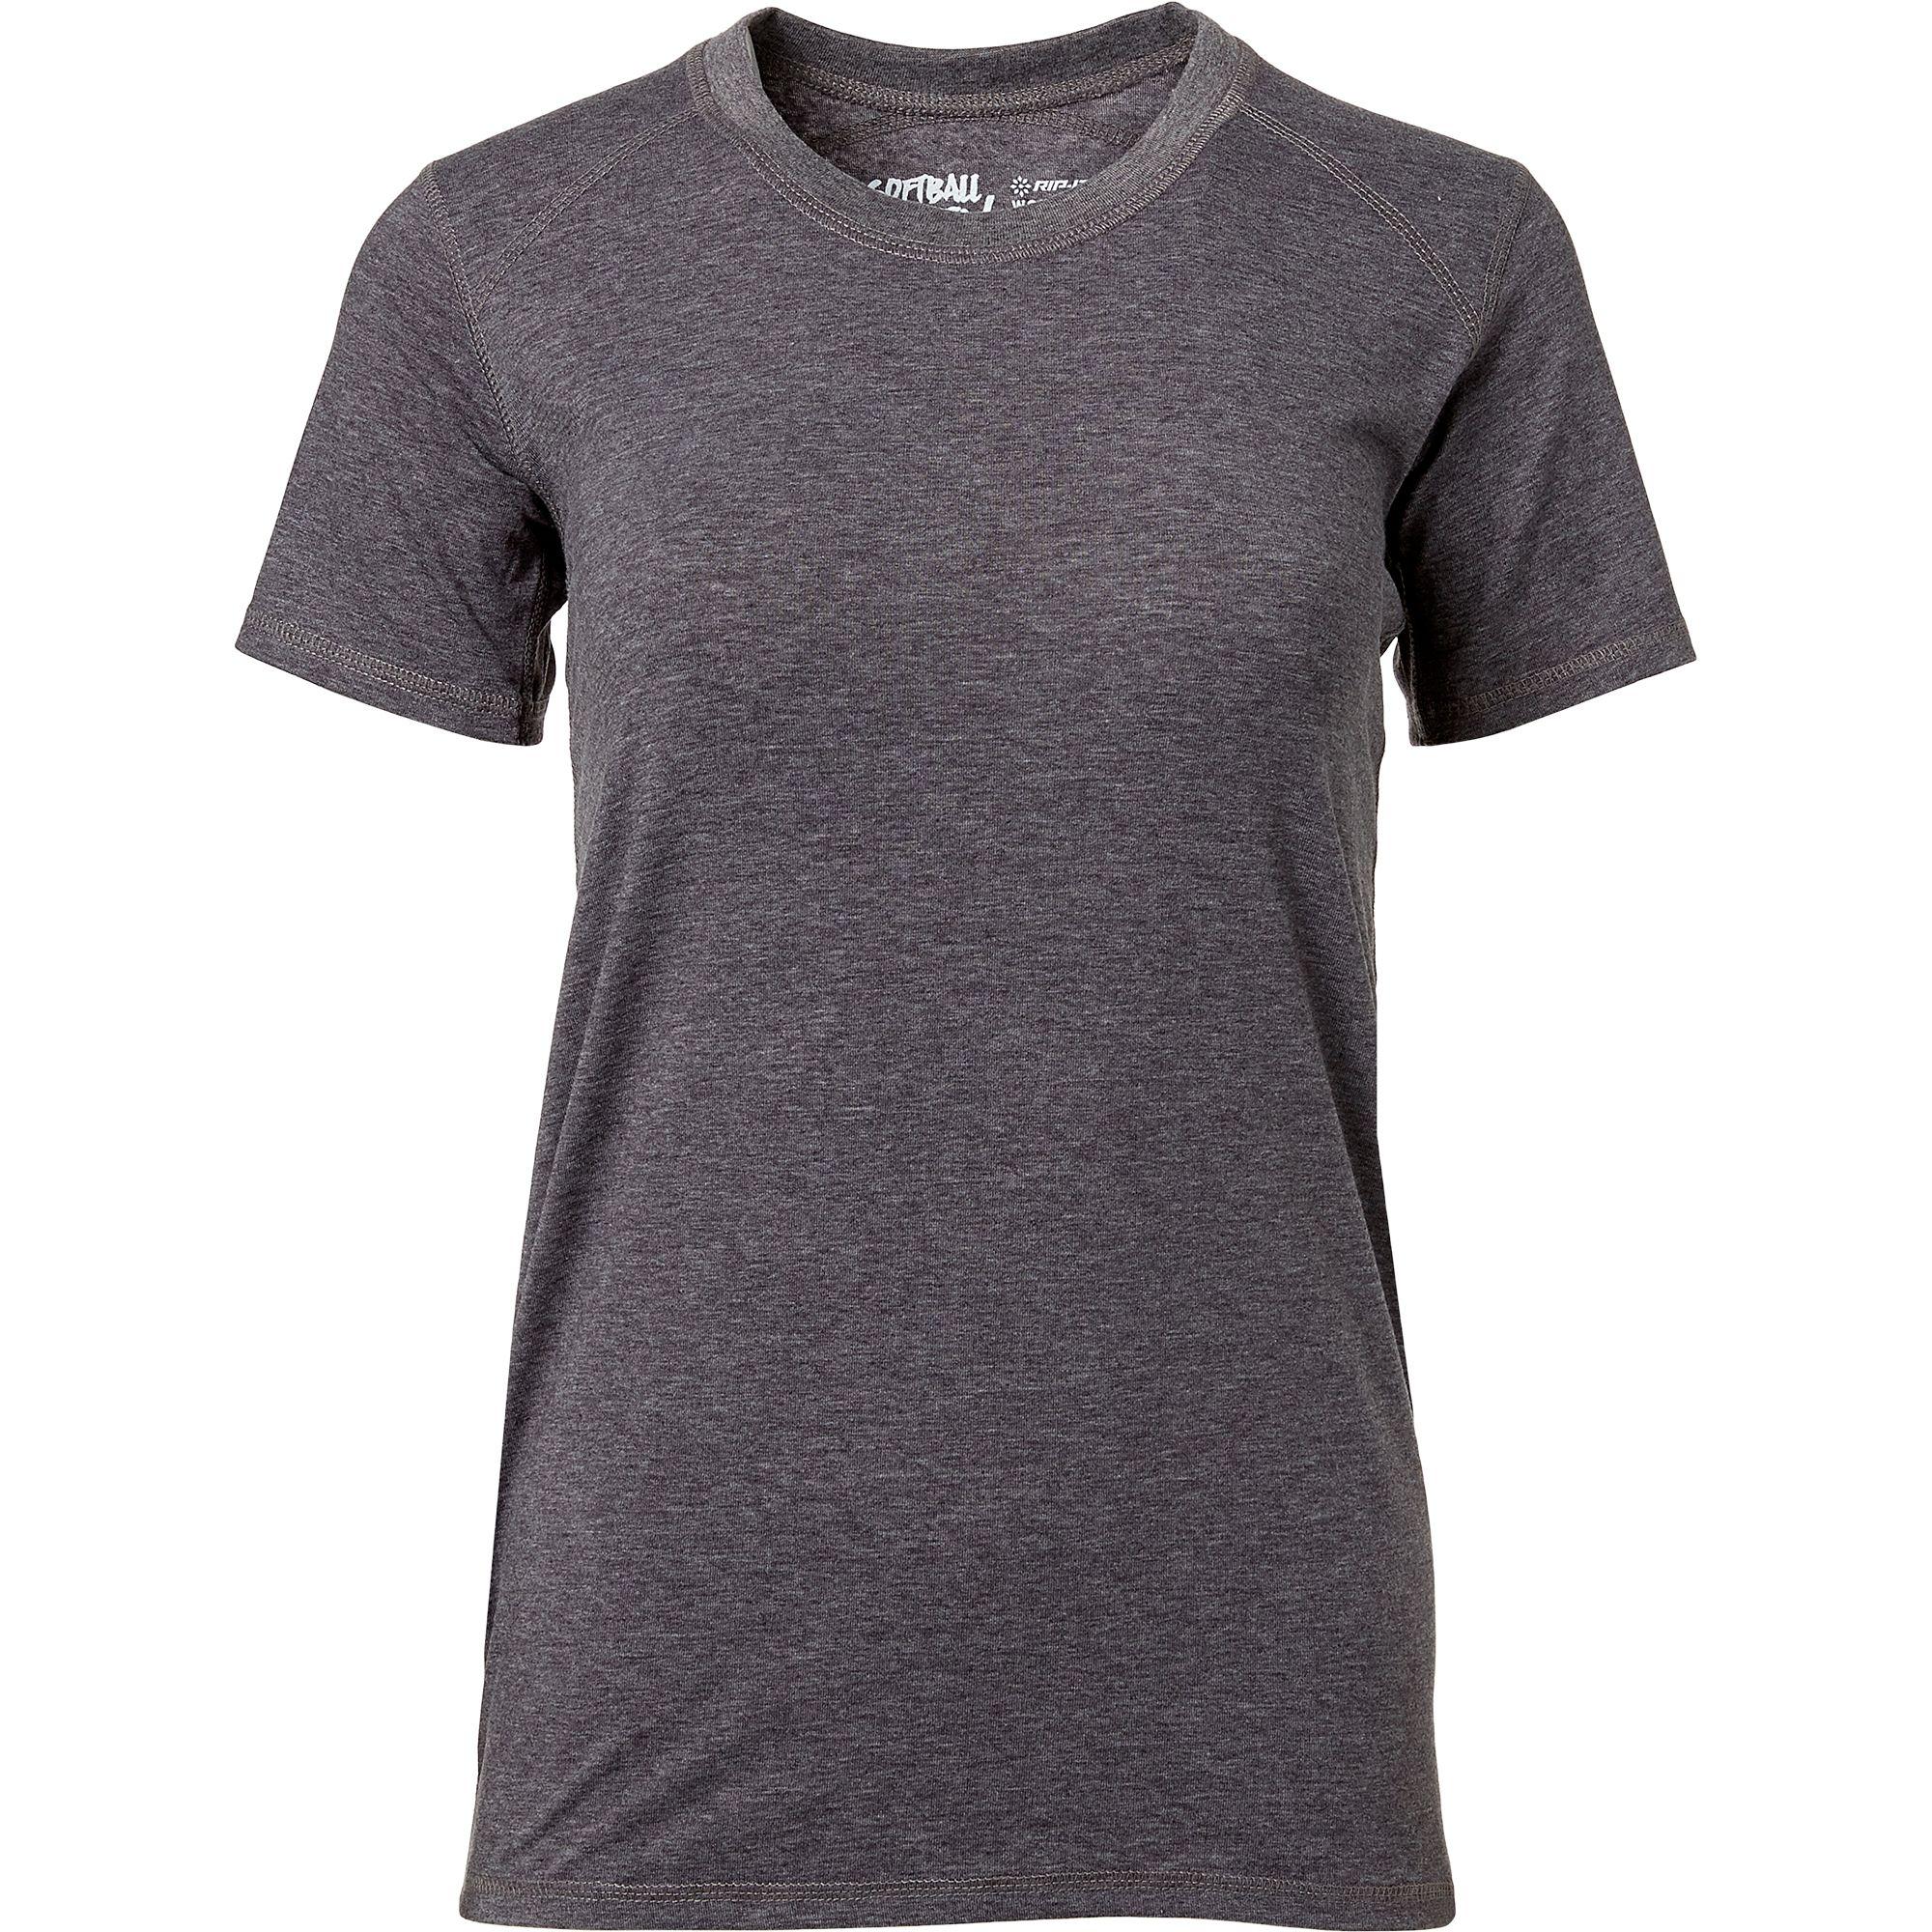 RIP-IT Women's Softball Team T-Shirt $8 or Mizuno Softball Women's V-Neck T-shirt (grey or white) $10 + Free Shipping